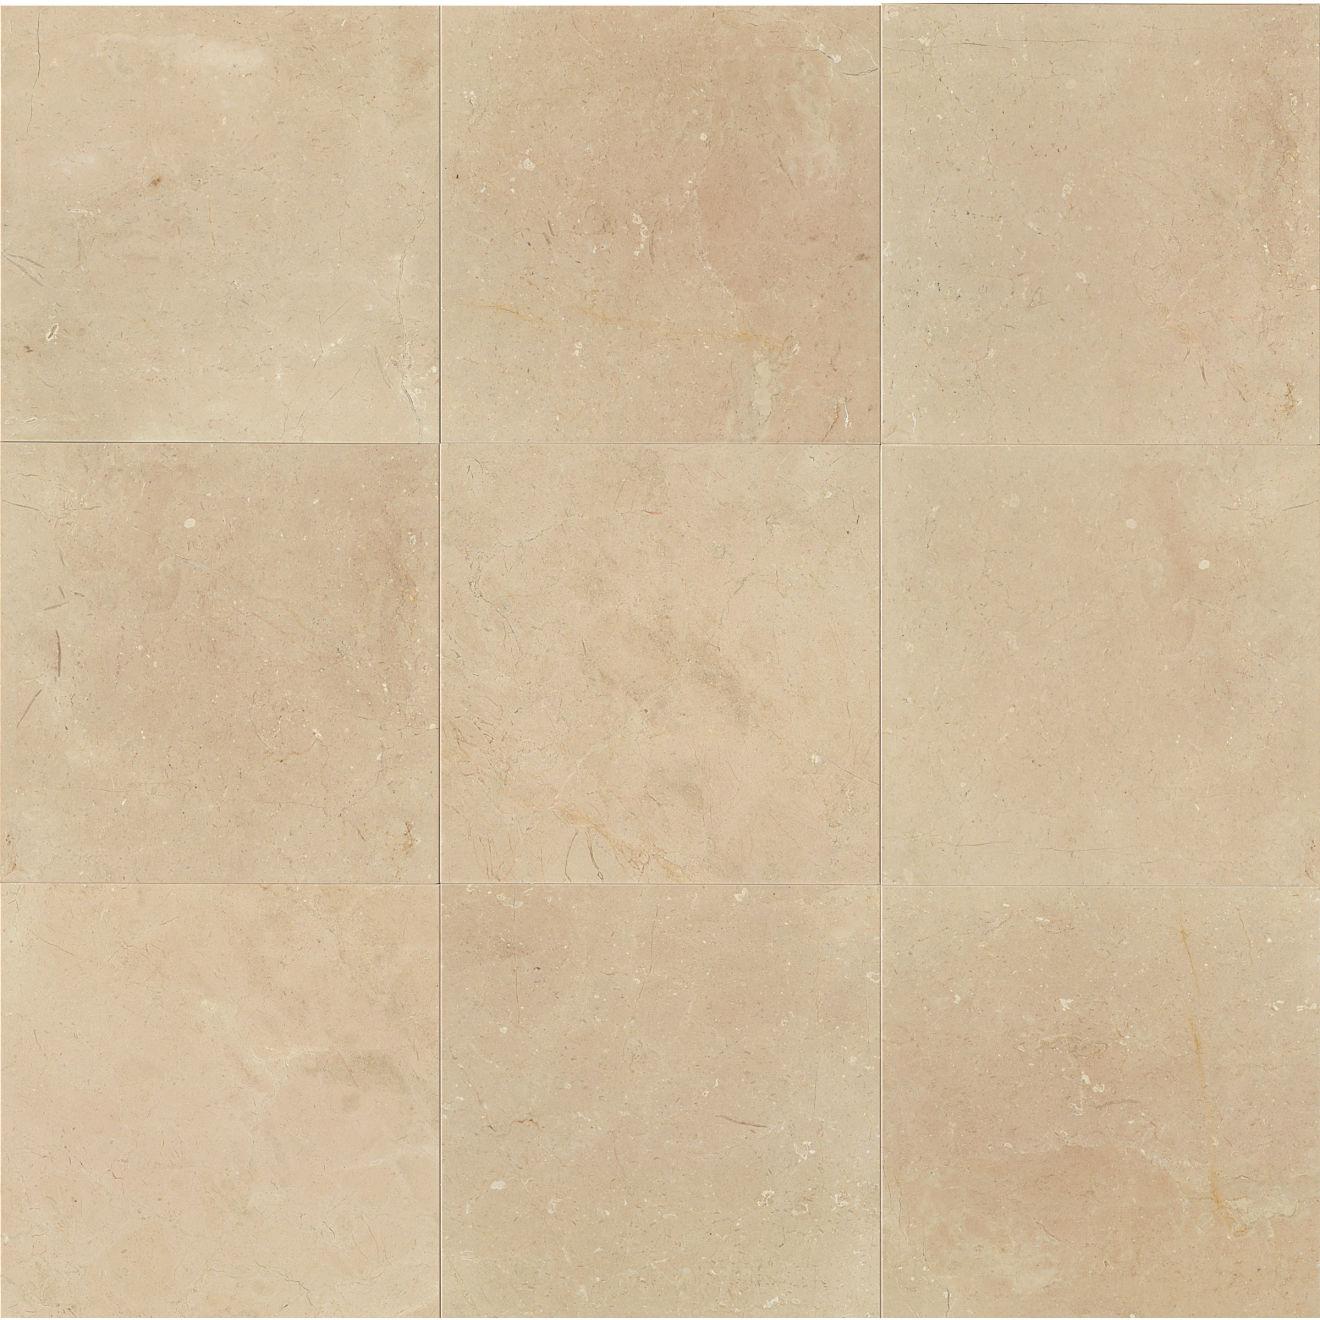 "Crema Marfil Classic 18"" x 18"" Floor & Wall Tile"